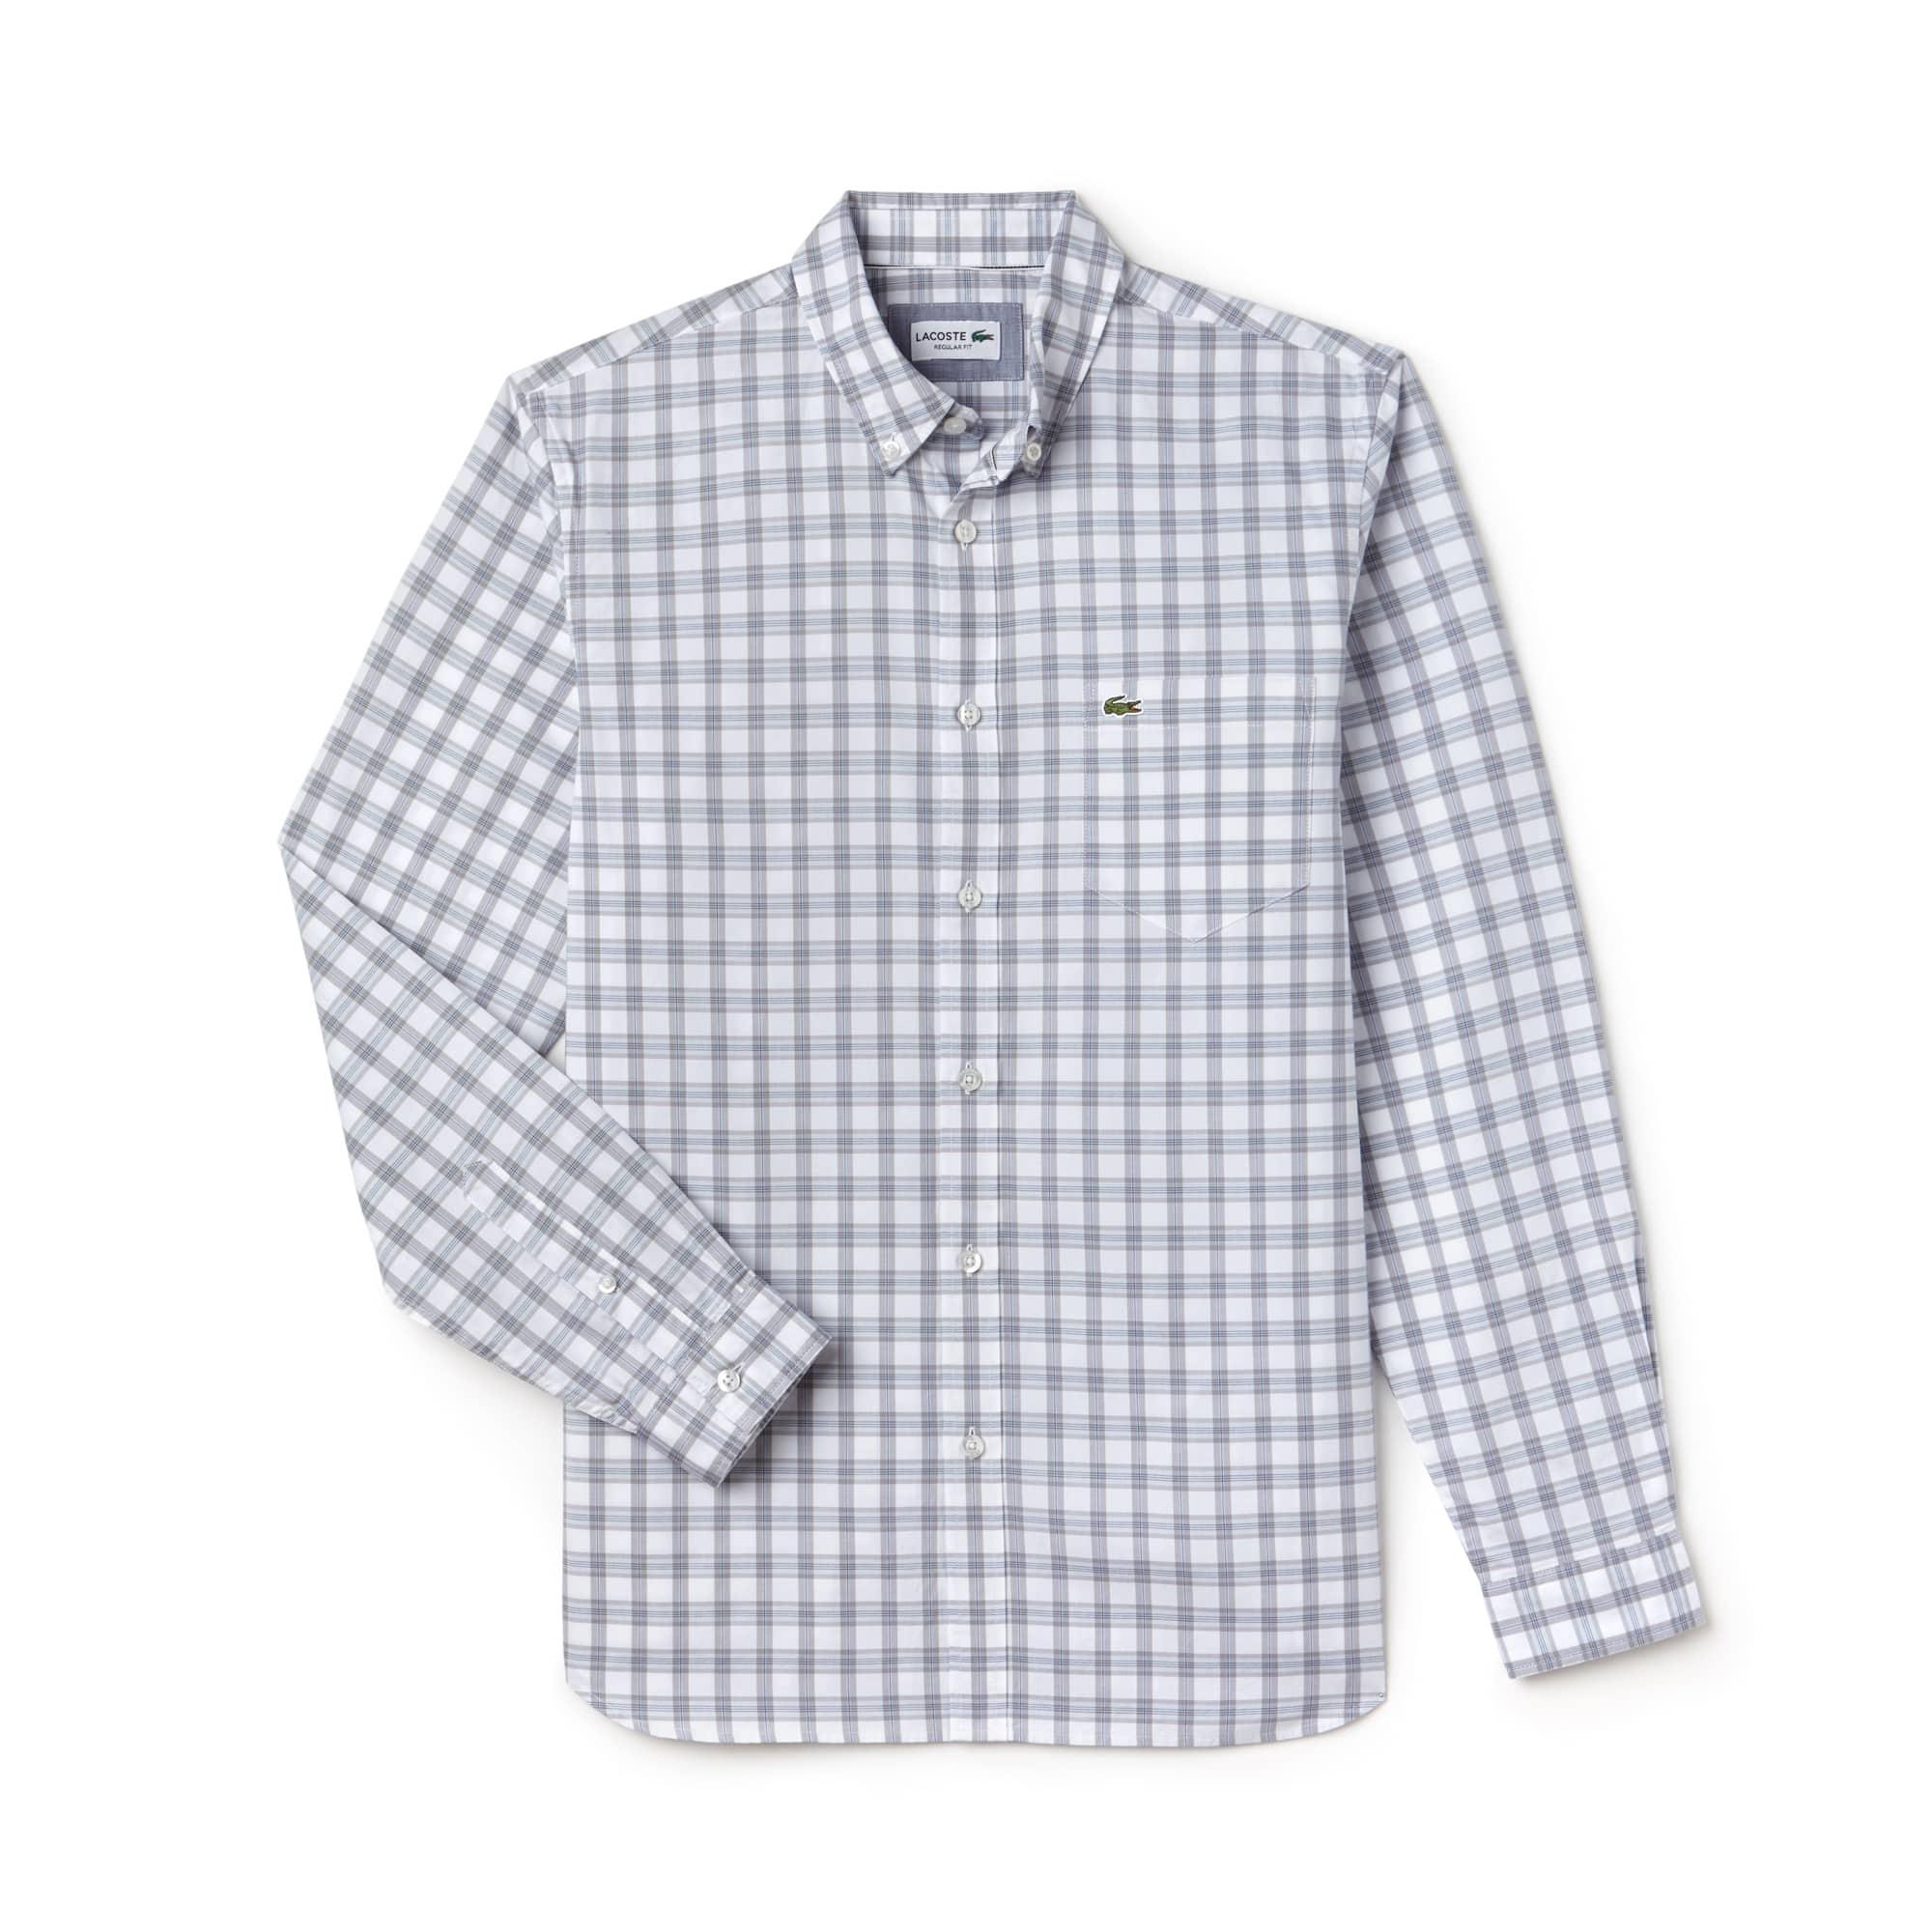 Men's Regular Fit Check Oxford Cotton Shirt